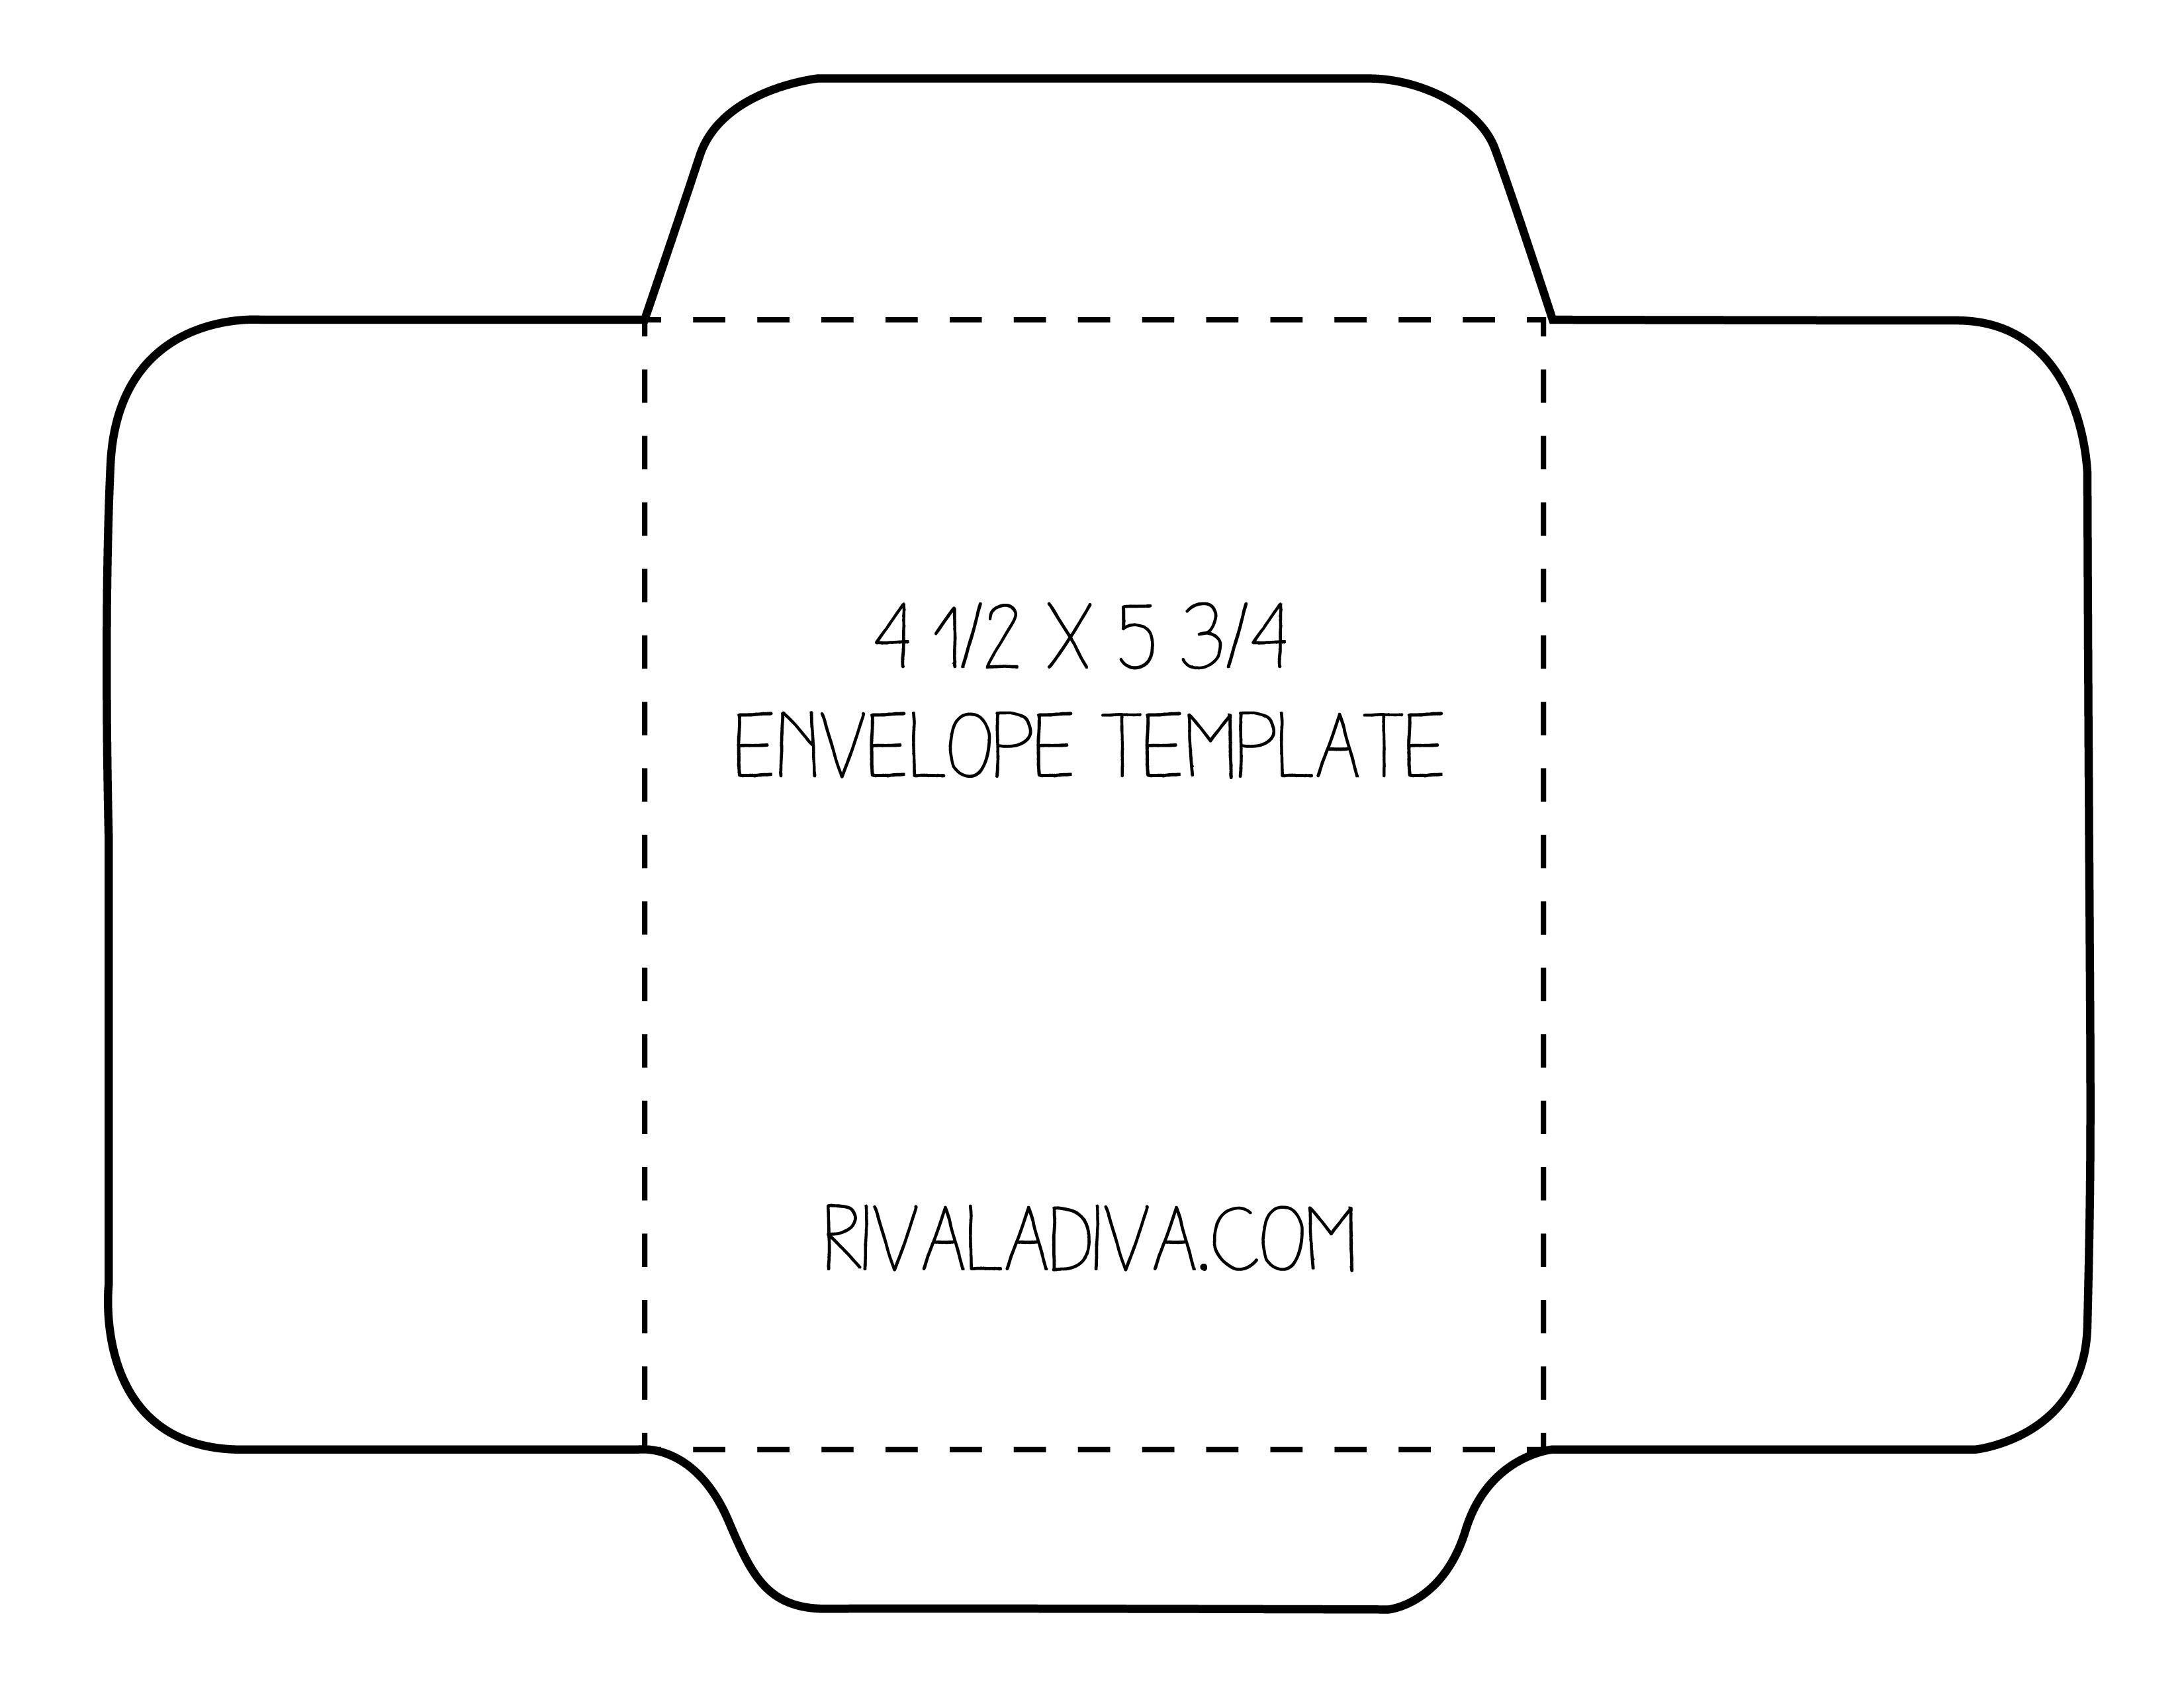 Envelope Template | Envelope Template For 8.5 X 11 Paper Diy - Free Printable Envelope Size 10 Template